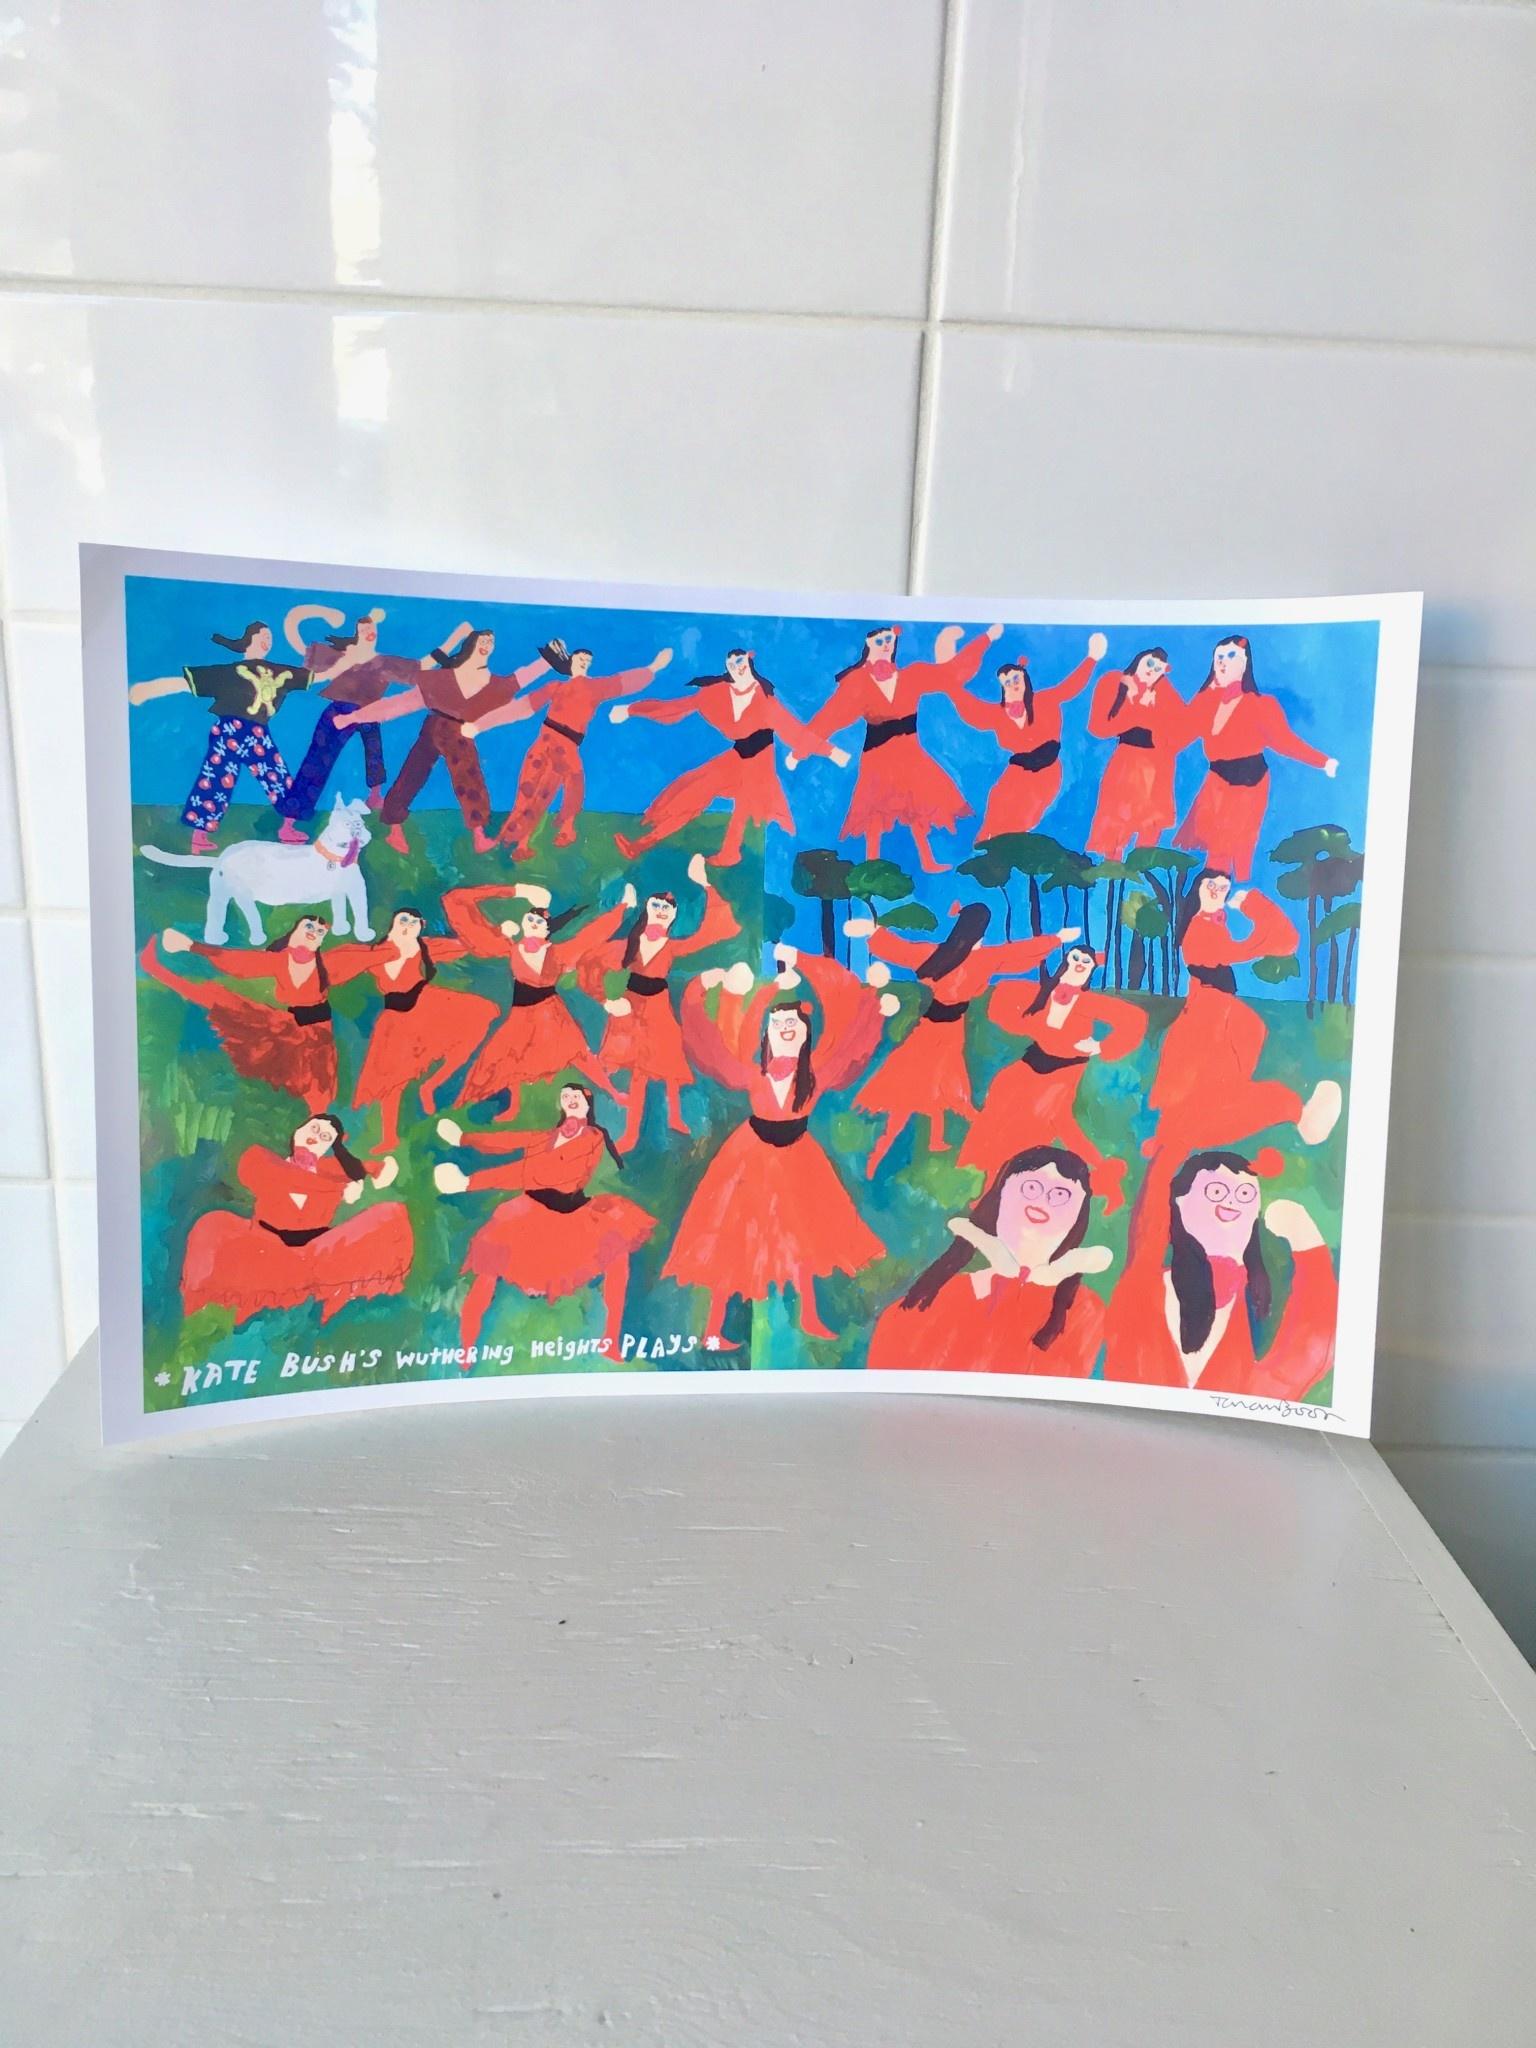 Tara Booth Grande Affiche de Tara Booth